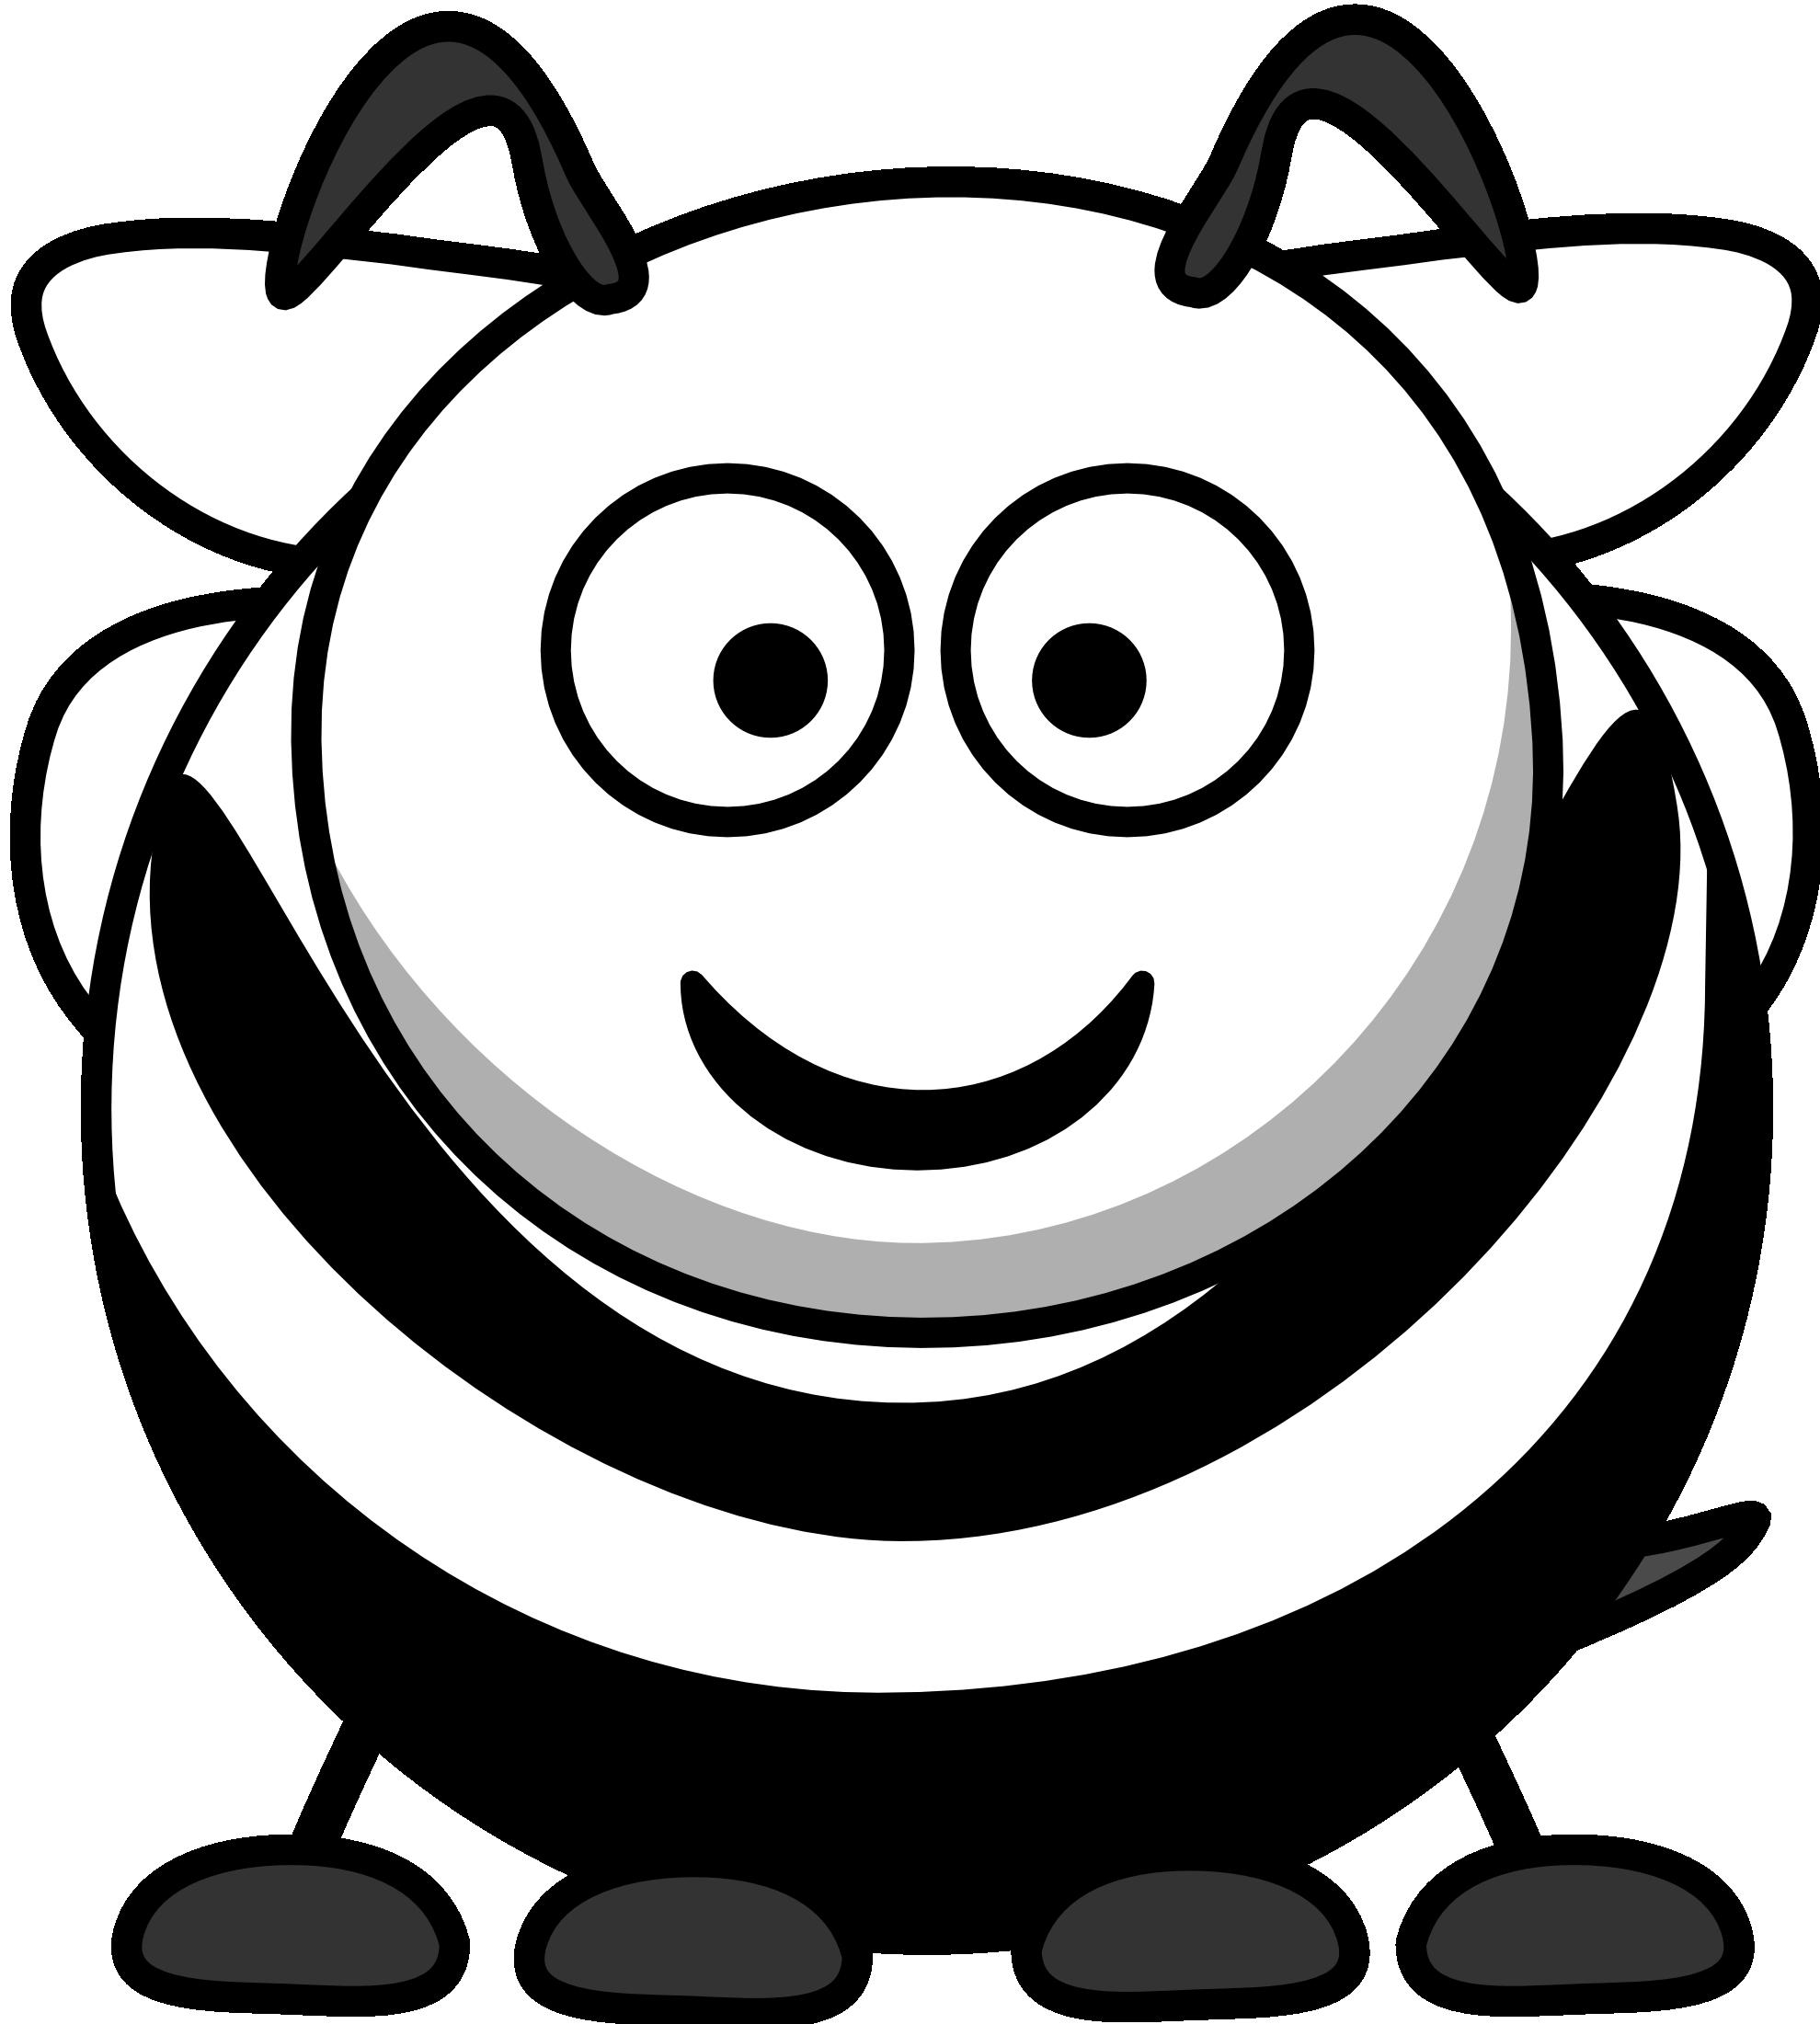 Clipart bee head. Black and white panda